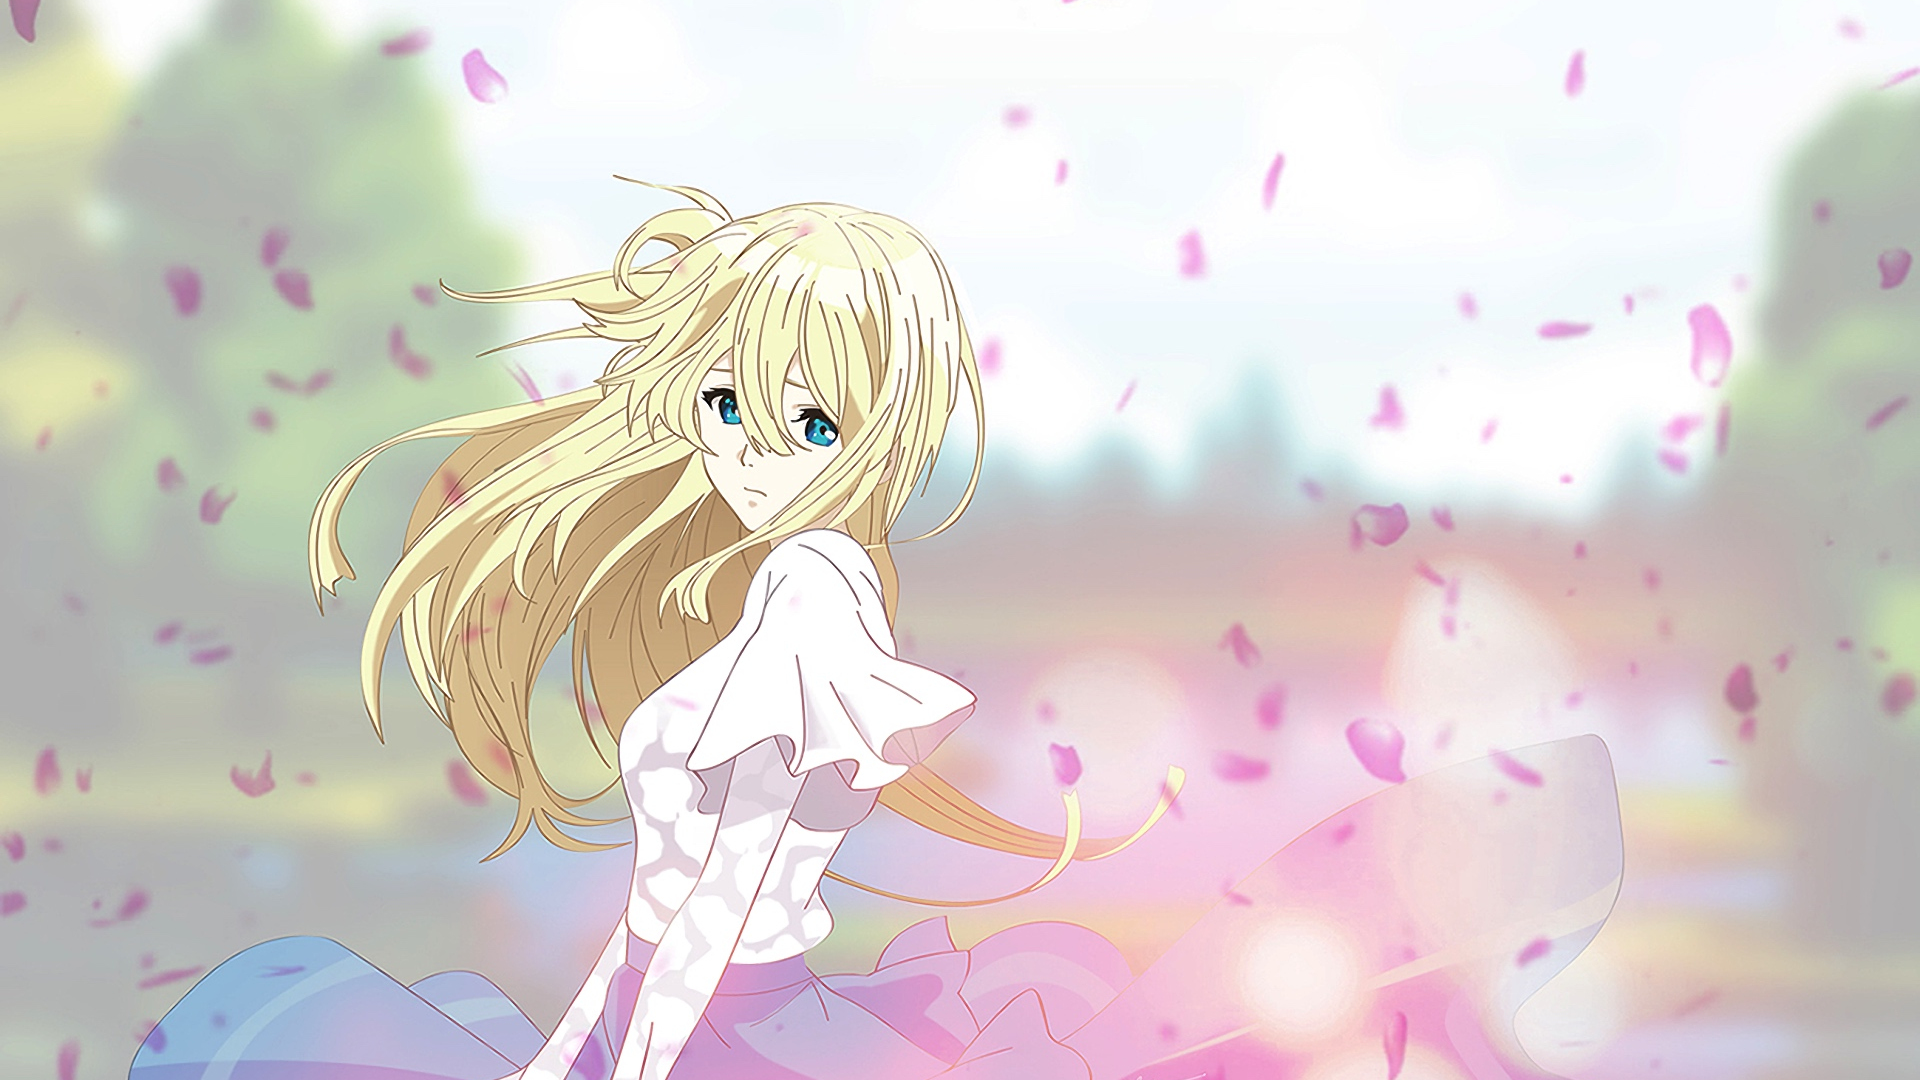 Download 1920x1080 Wallpaper Violet Evergarden Sad Anime Girl